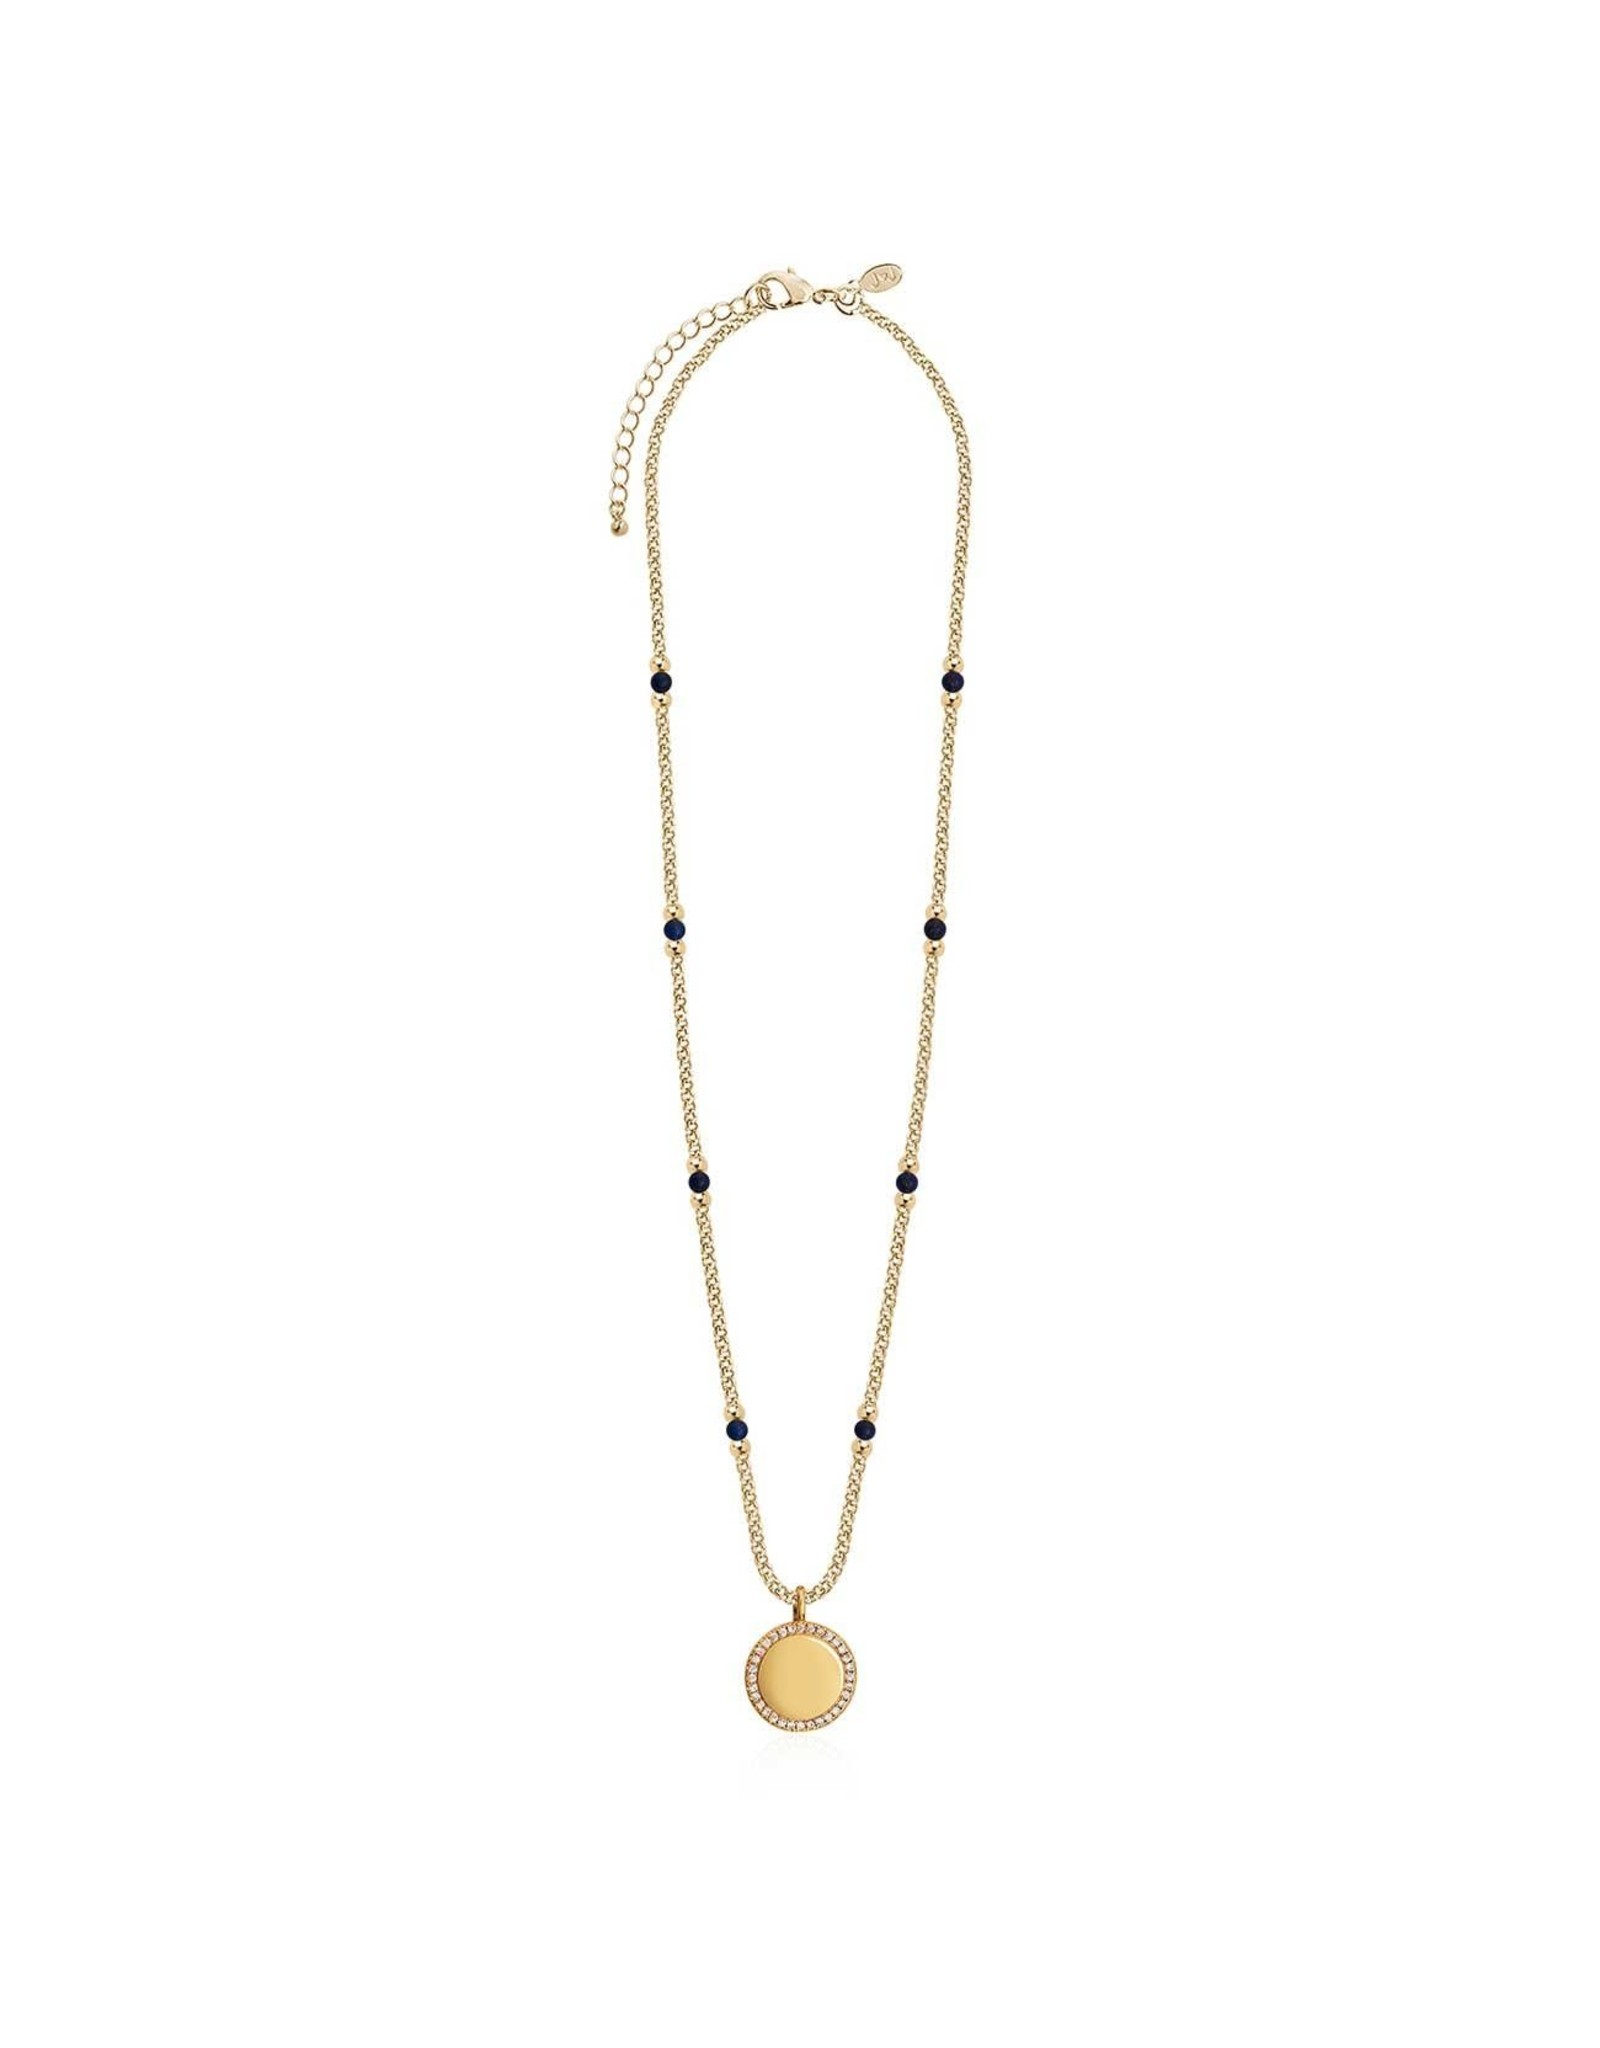 Joma Jewellery Wellness Gems - Lapis Lazuli - Ketting